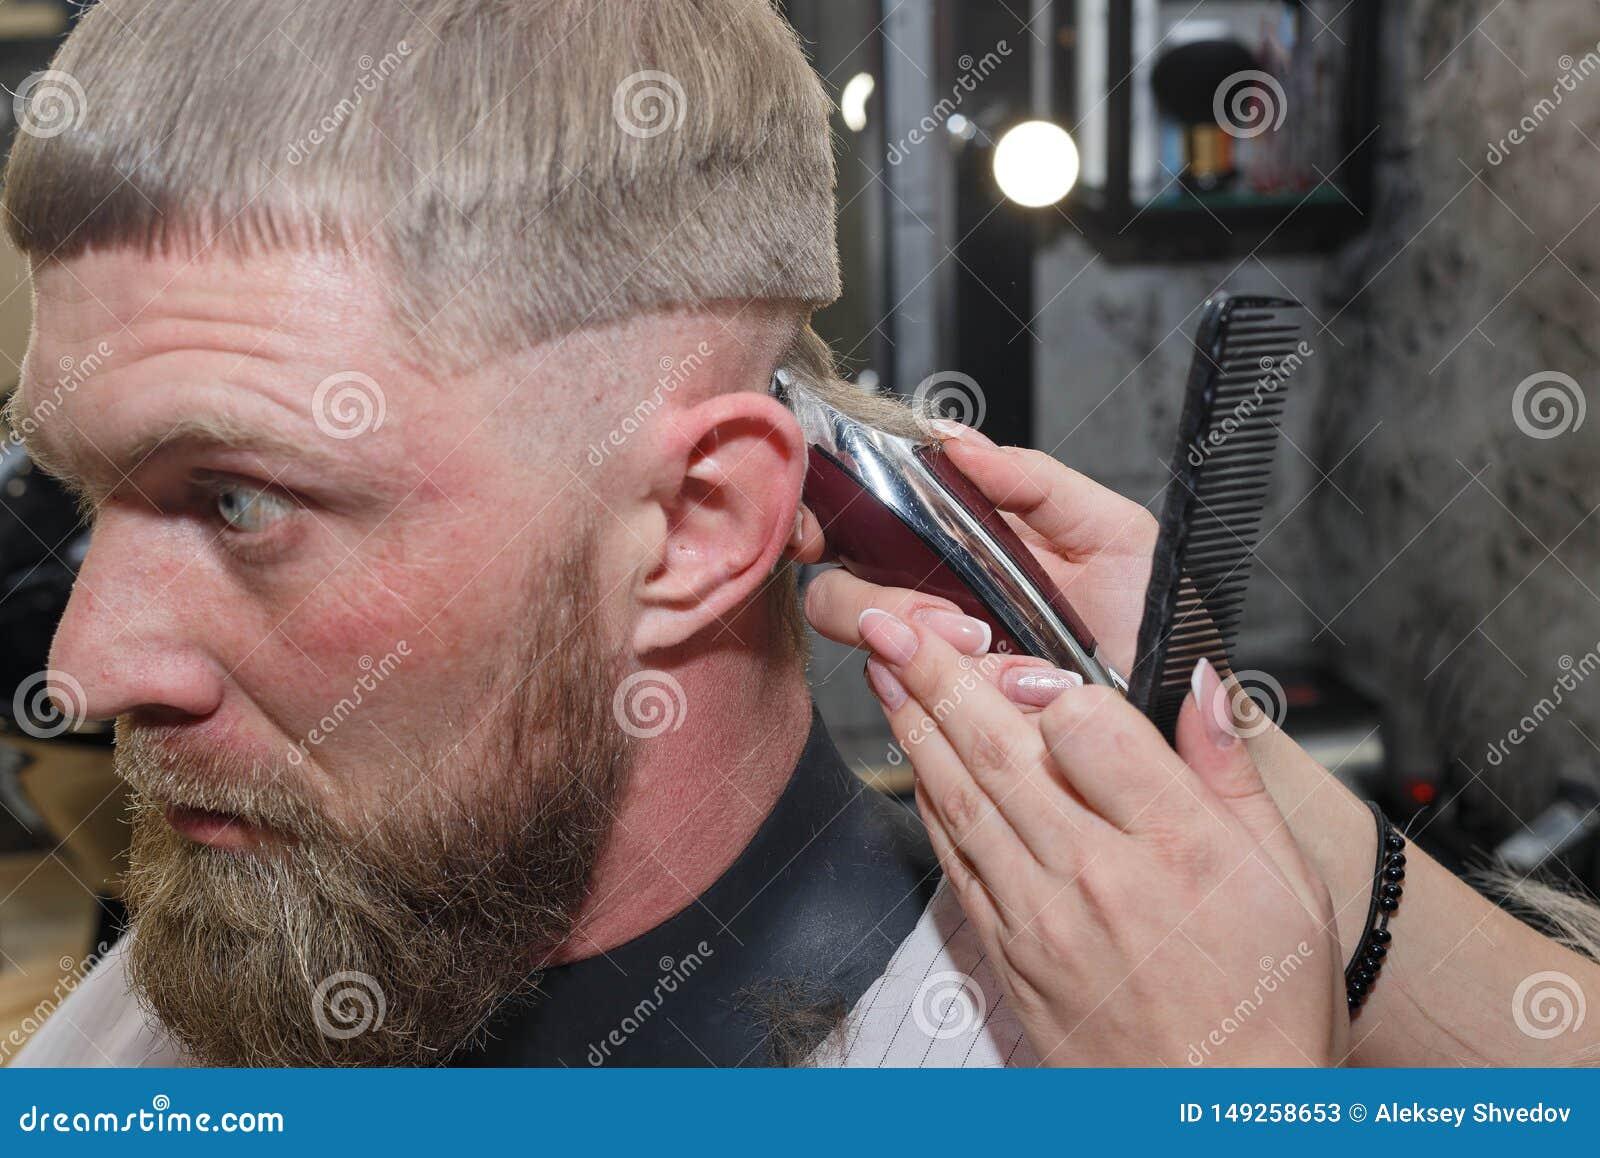 Primer del hombre de la m?quina de los cortes del peluquero en una barber?a